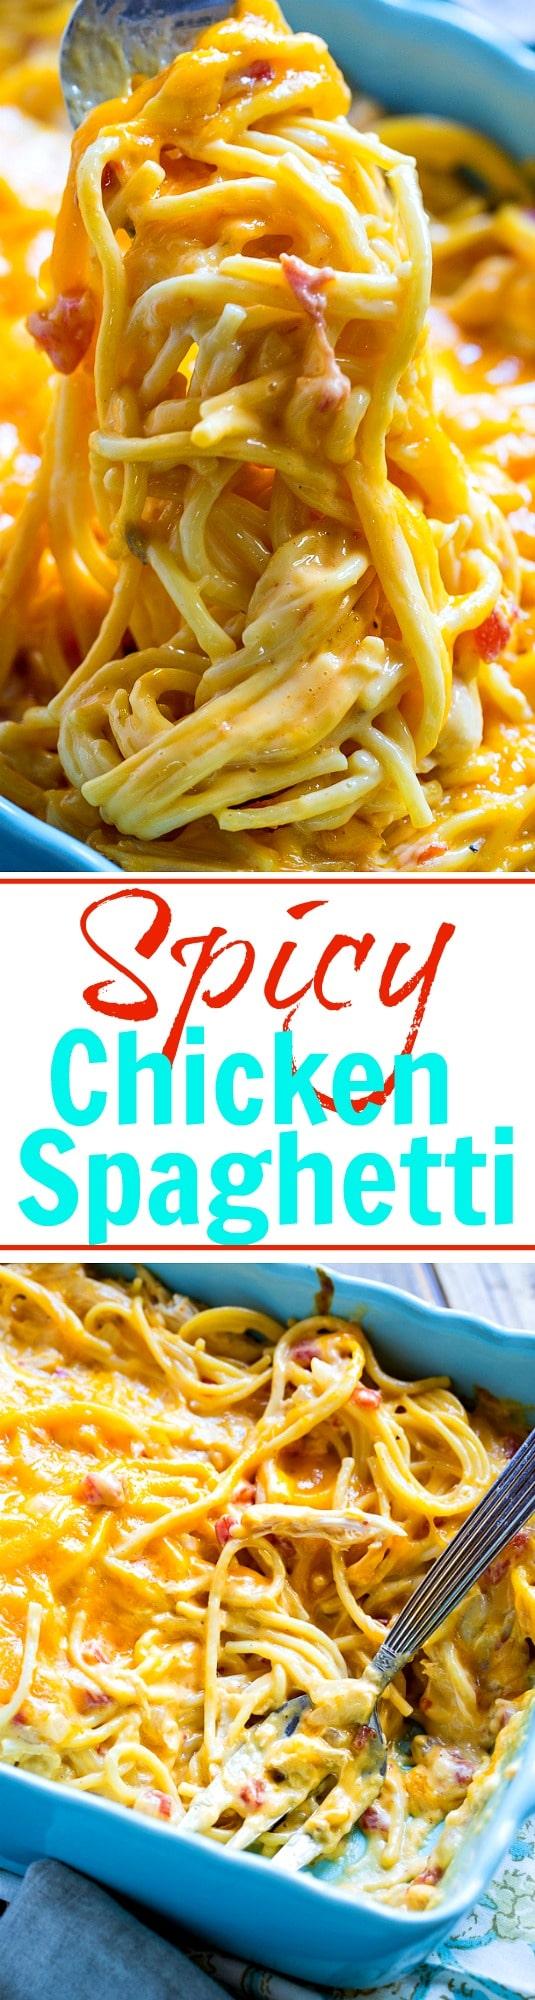 Spicy Chicken Spaghetti- cheesy, creamy comfort food!